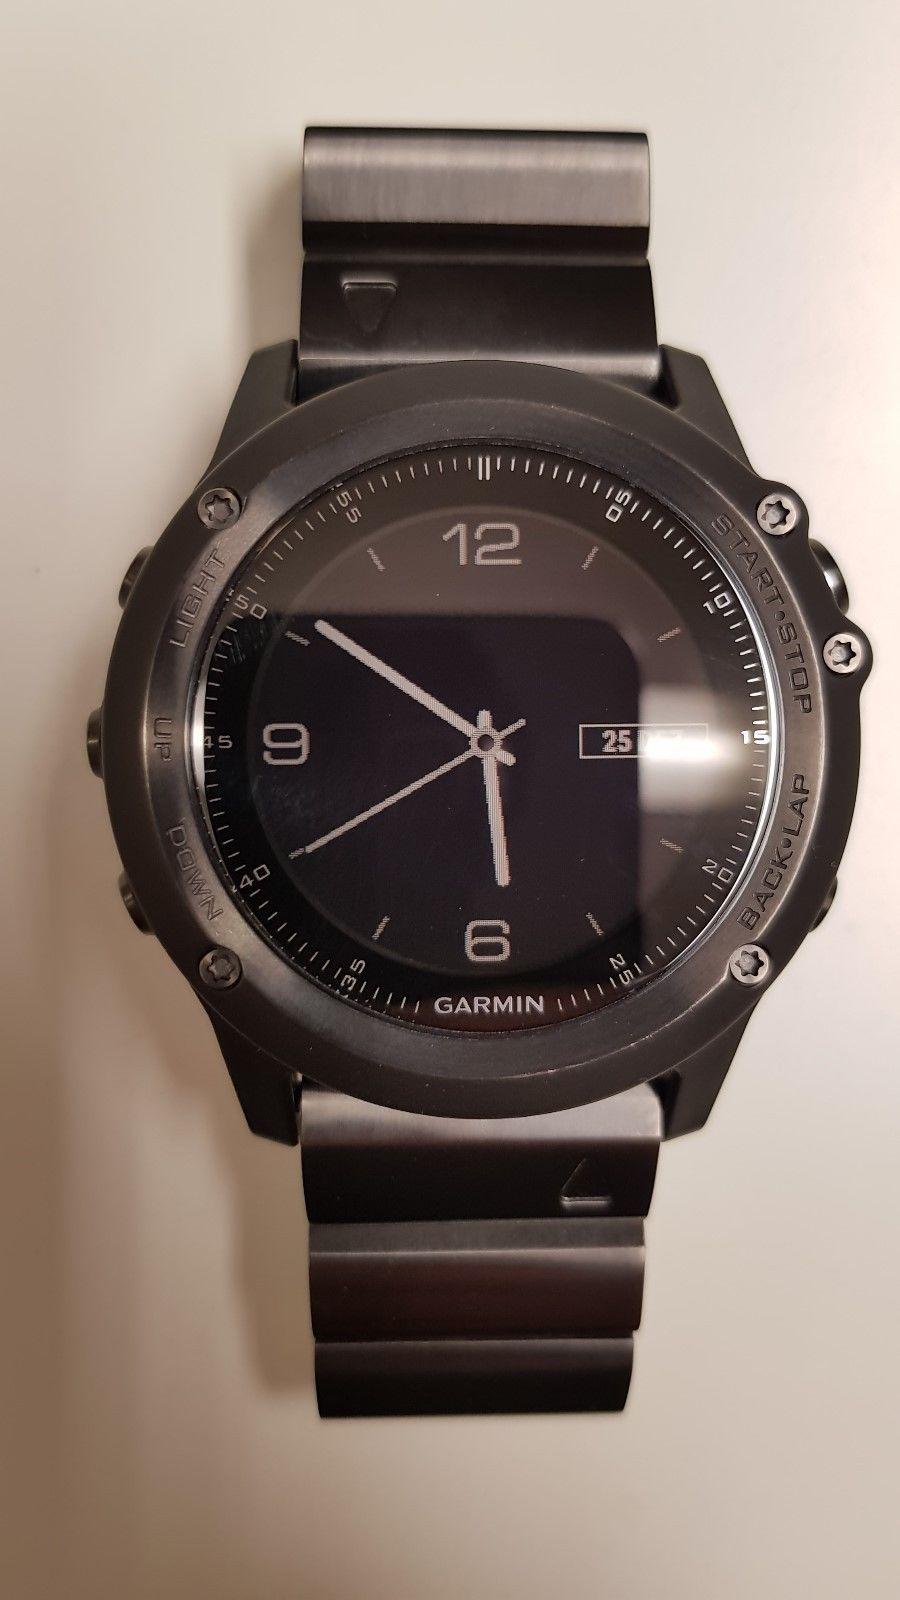 Garmin Fenix 3 Saphir HR mit Edelstahl-Armband